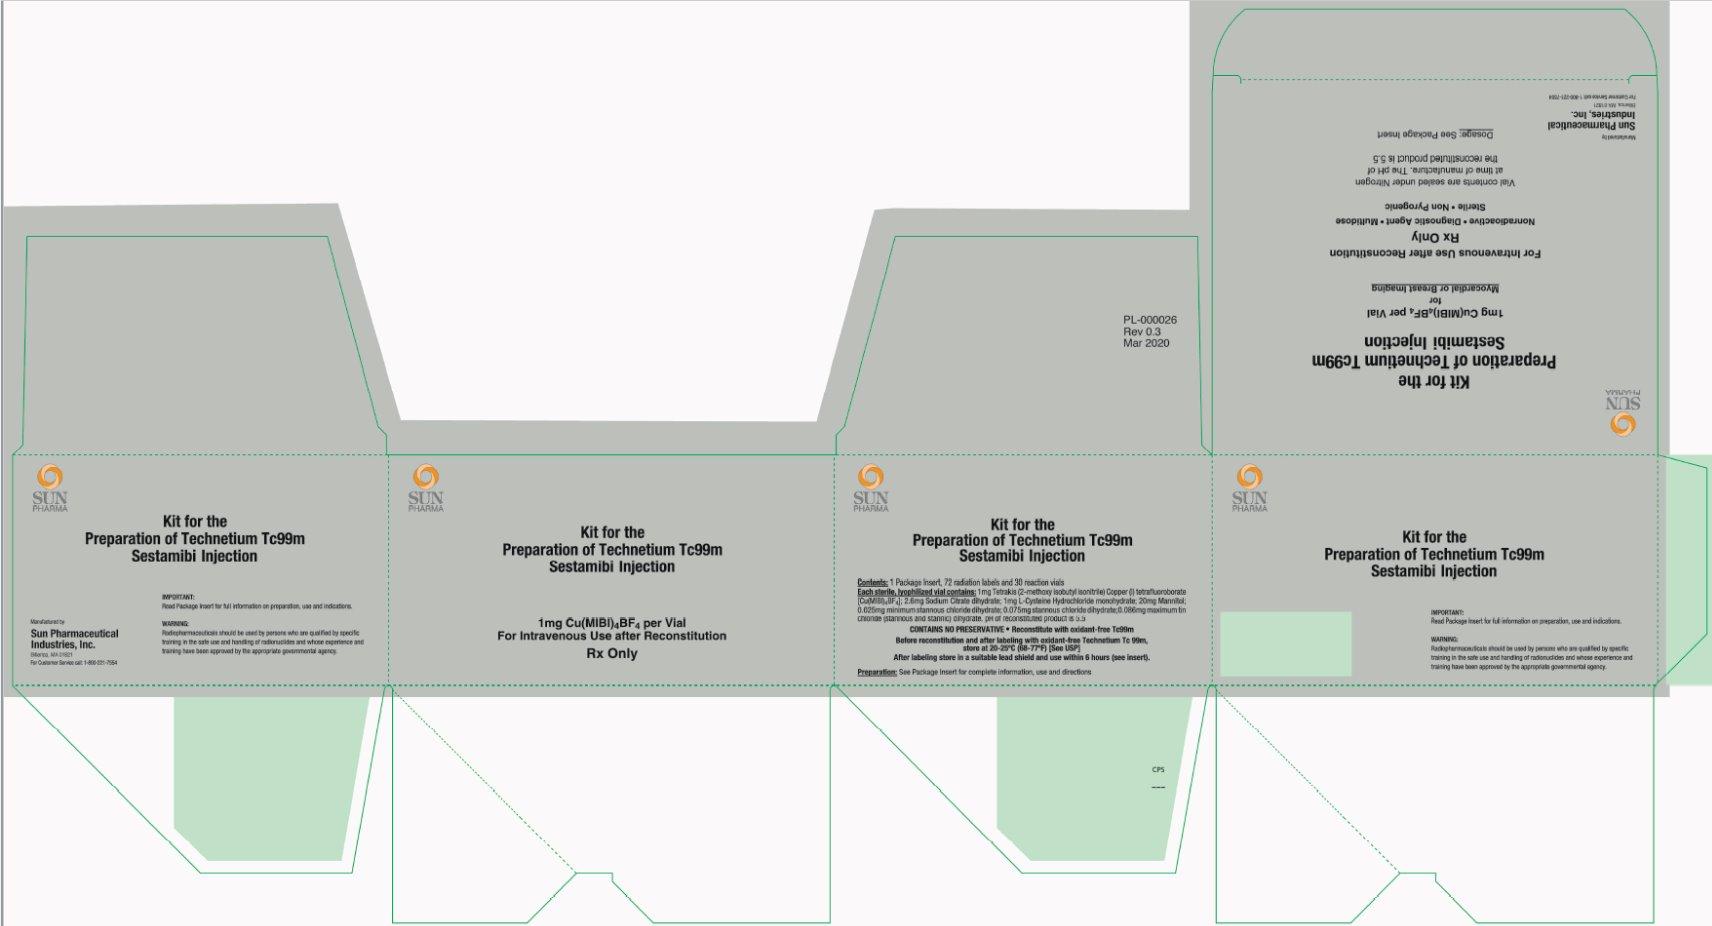 Package/Label-Principal display panel - 30 vial carton